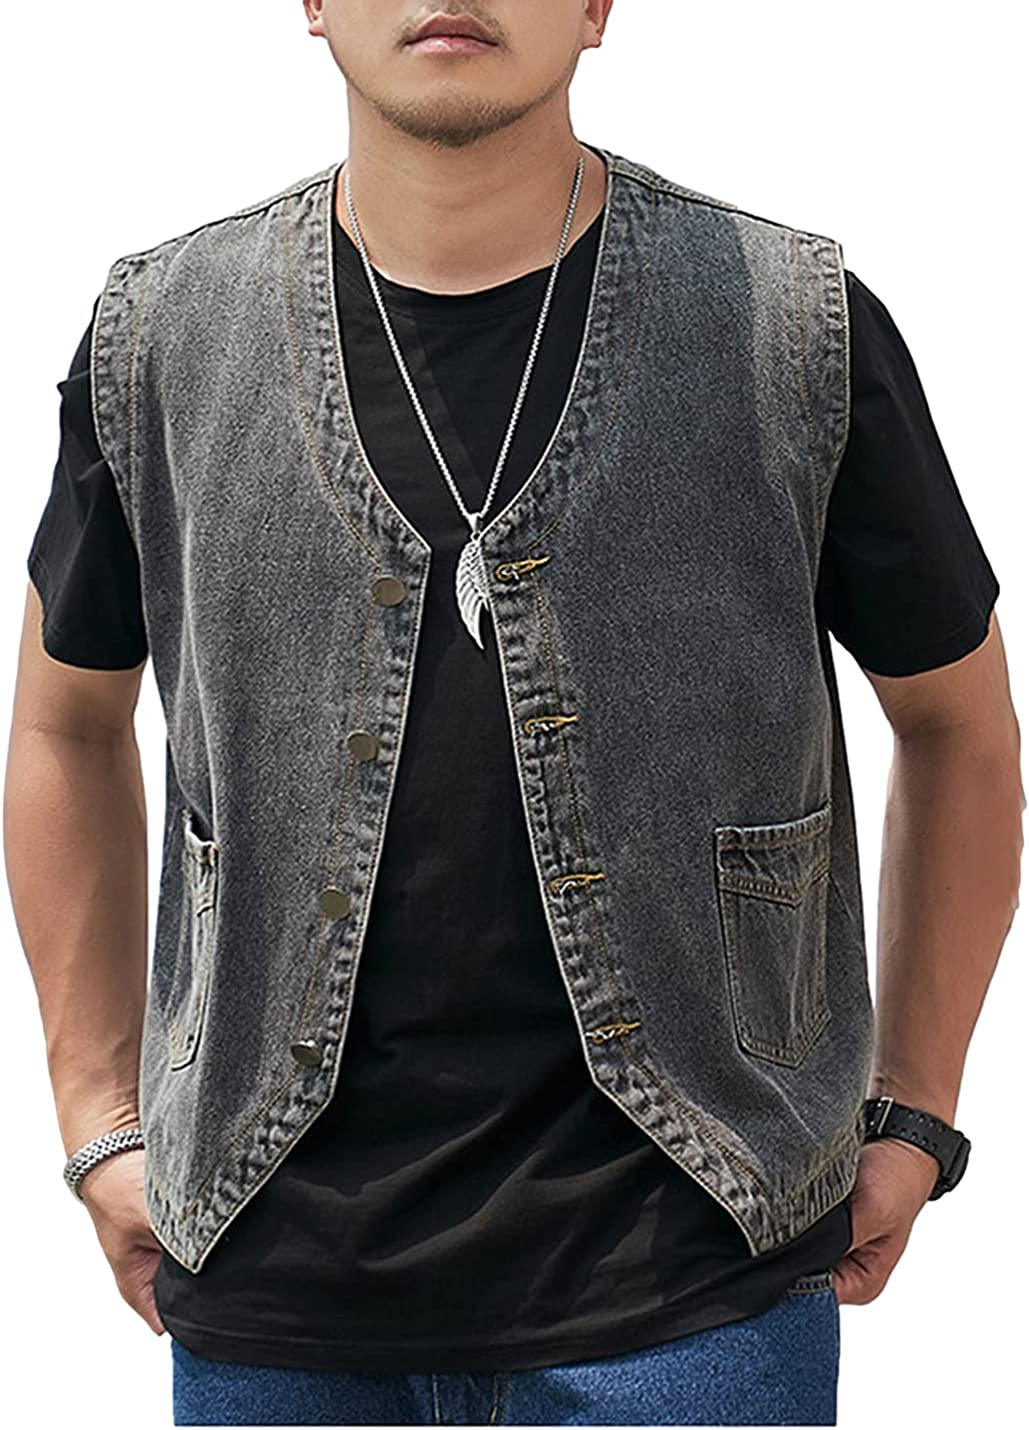 Omoone Mens Casual Denim Vest Sleeveless Jean Vests Jacket Button Down Jeans Vest